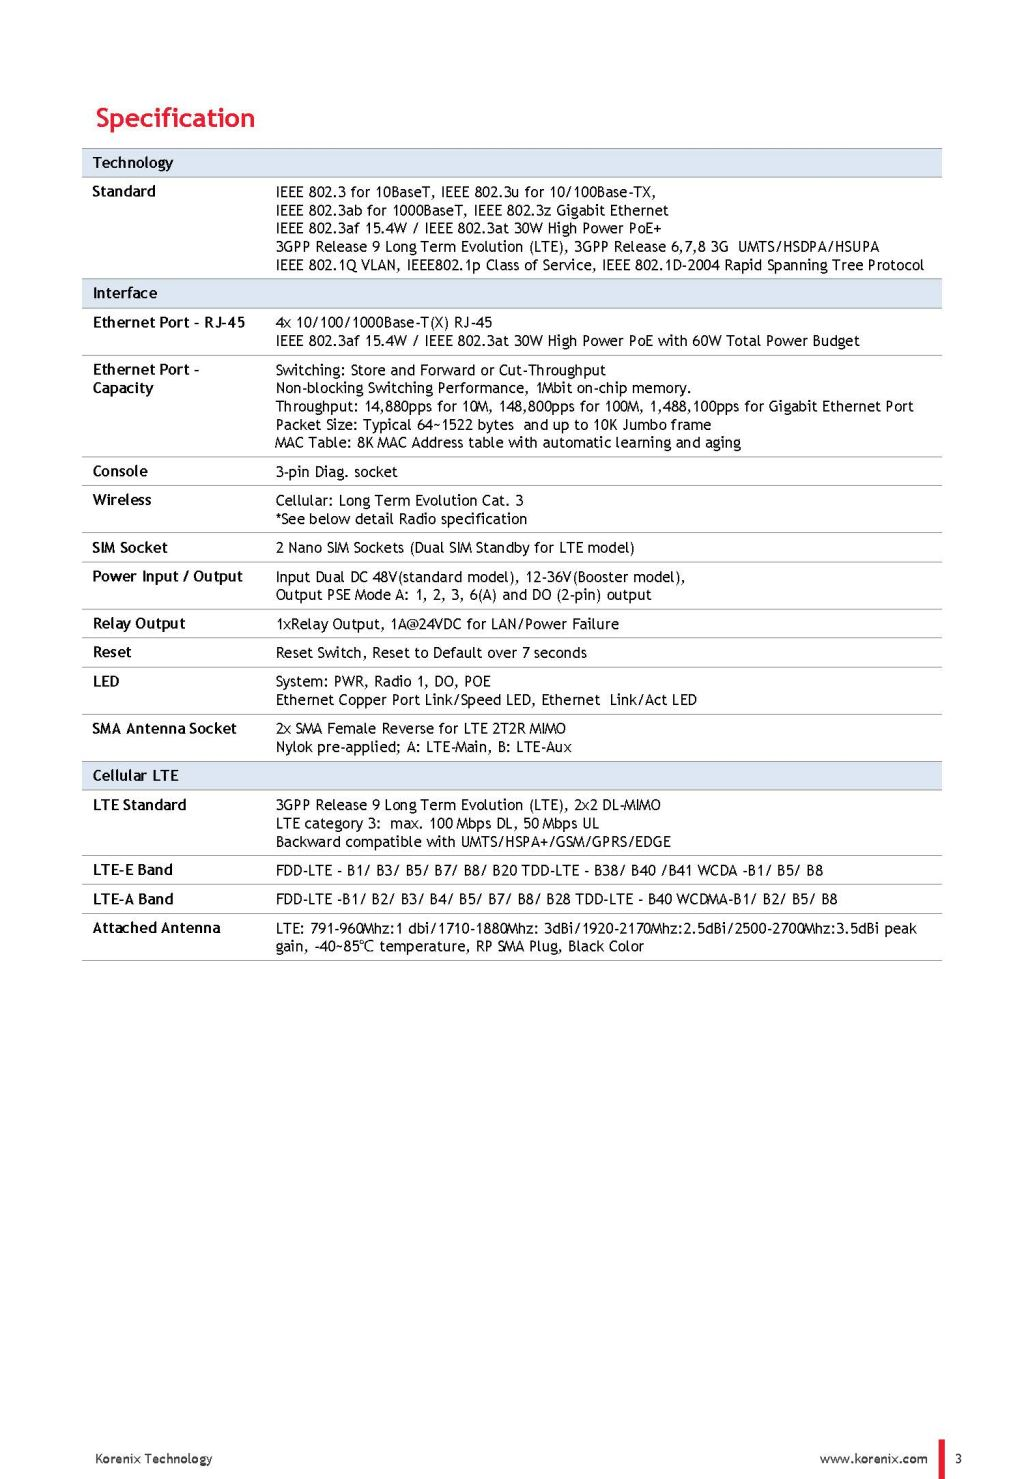 Korenix JetWave 2714G-LTE Industrial Cellular + 4GT Gigabit PoE Switch